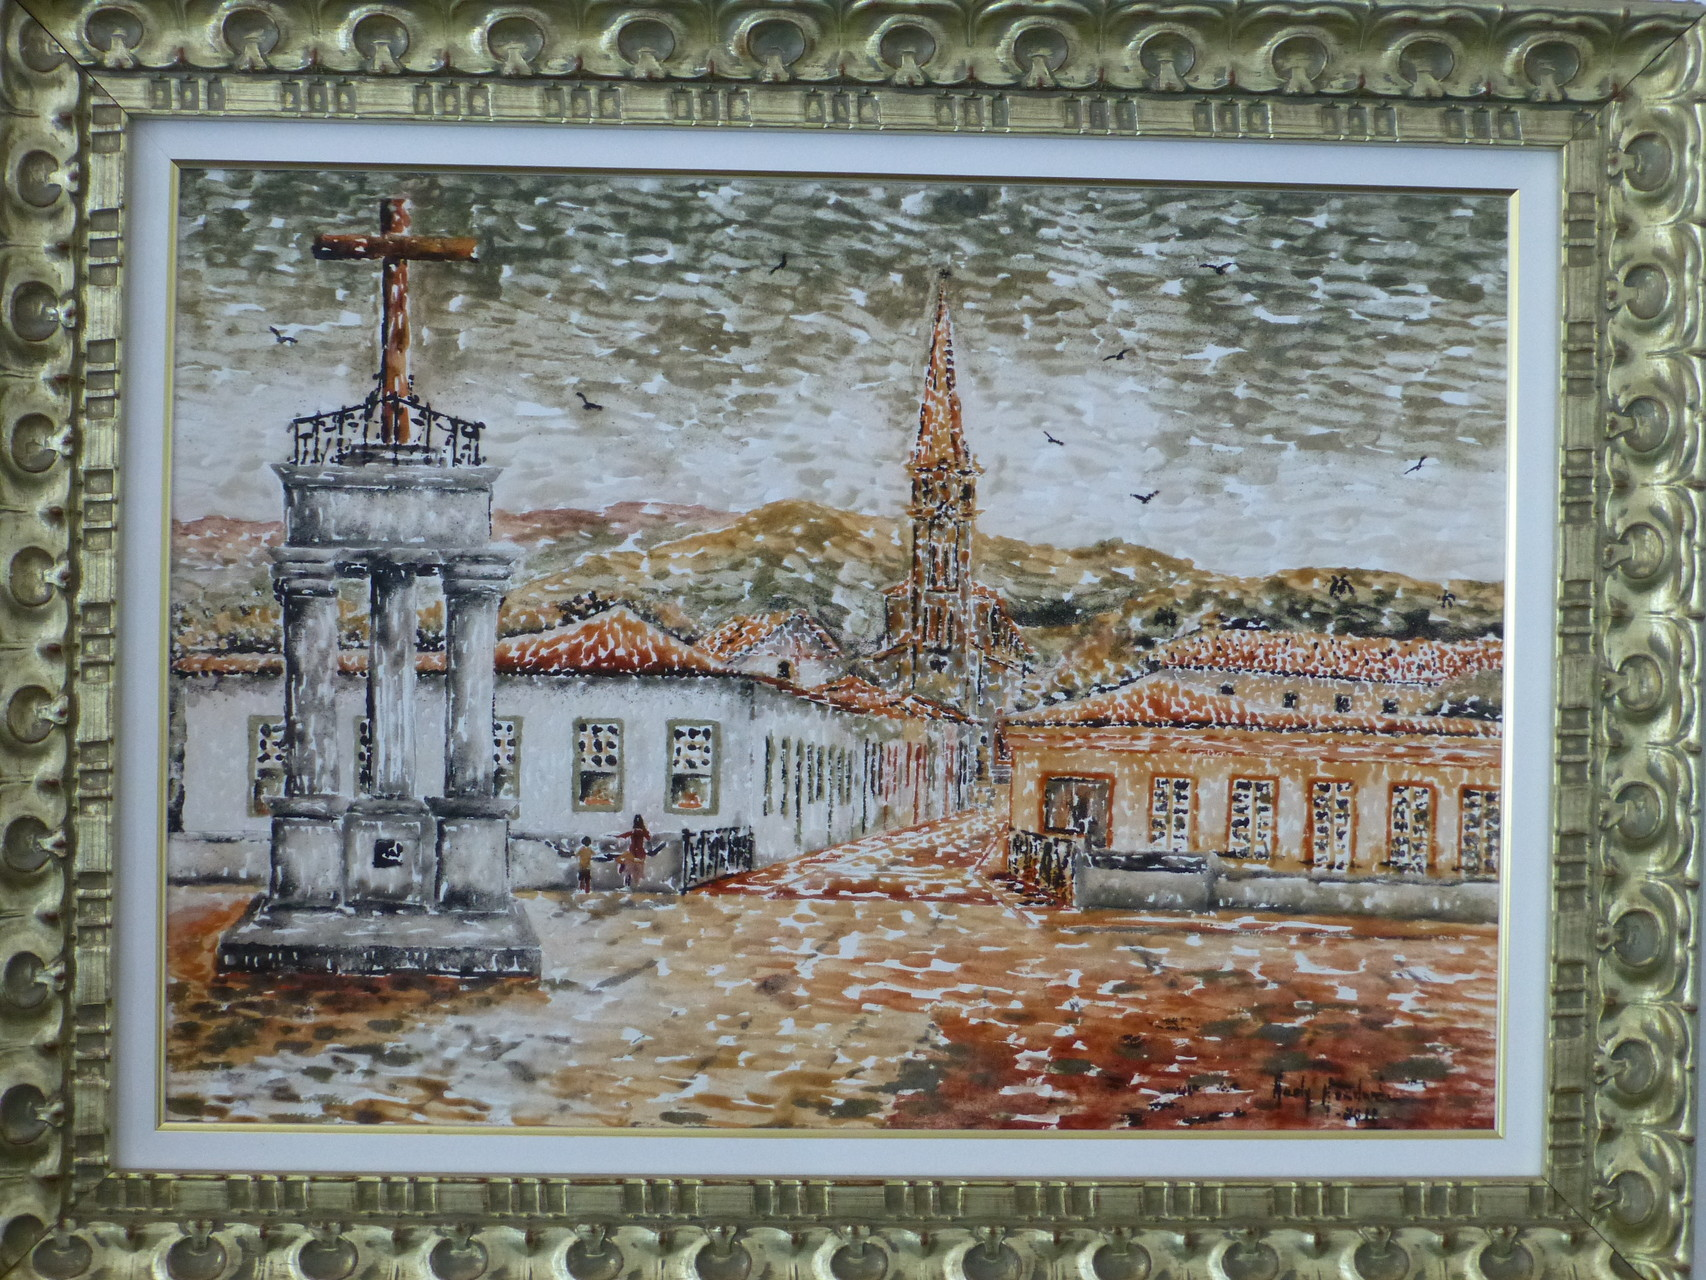 Malen mit Erde - Künstlerin Goiandira de Couto